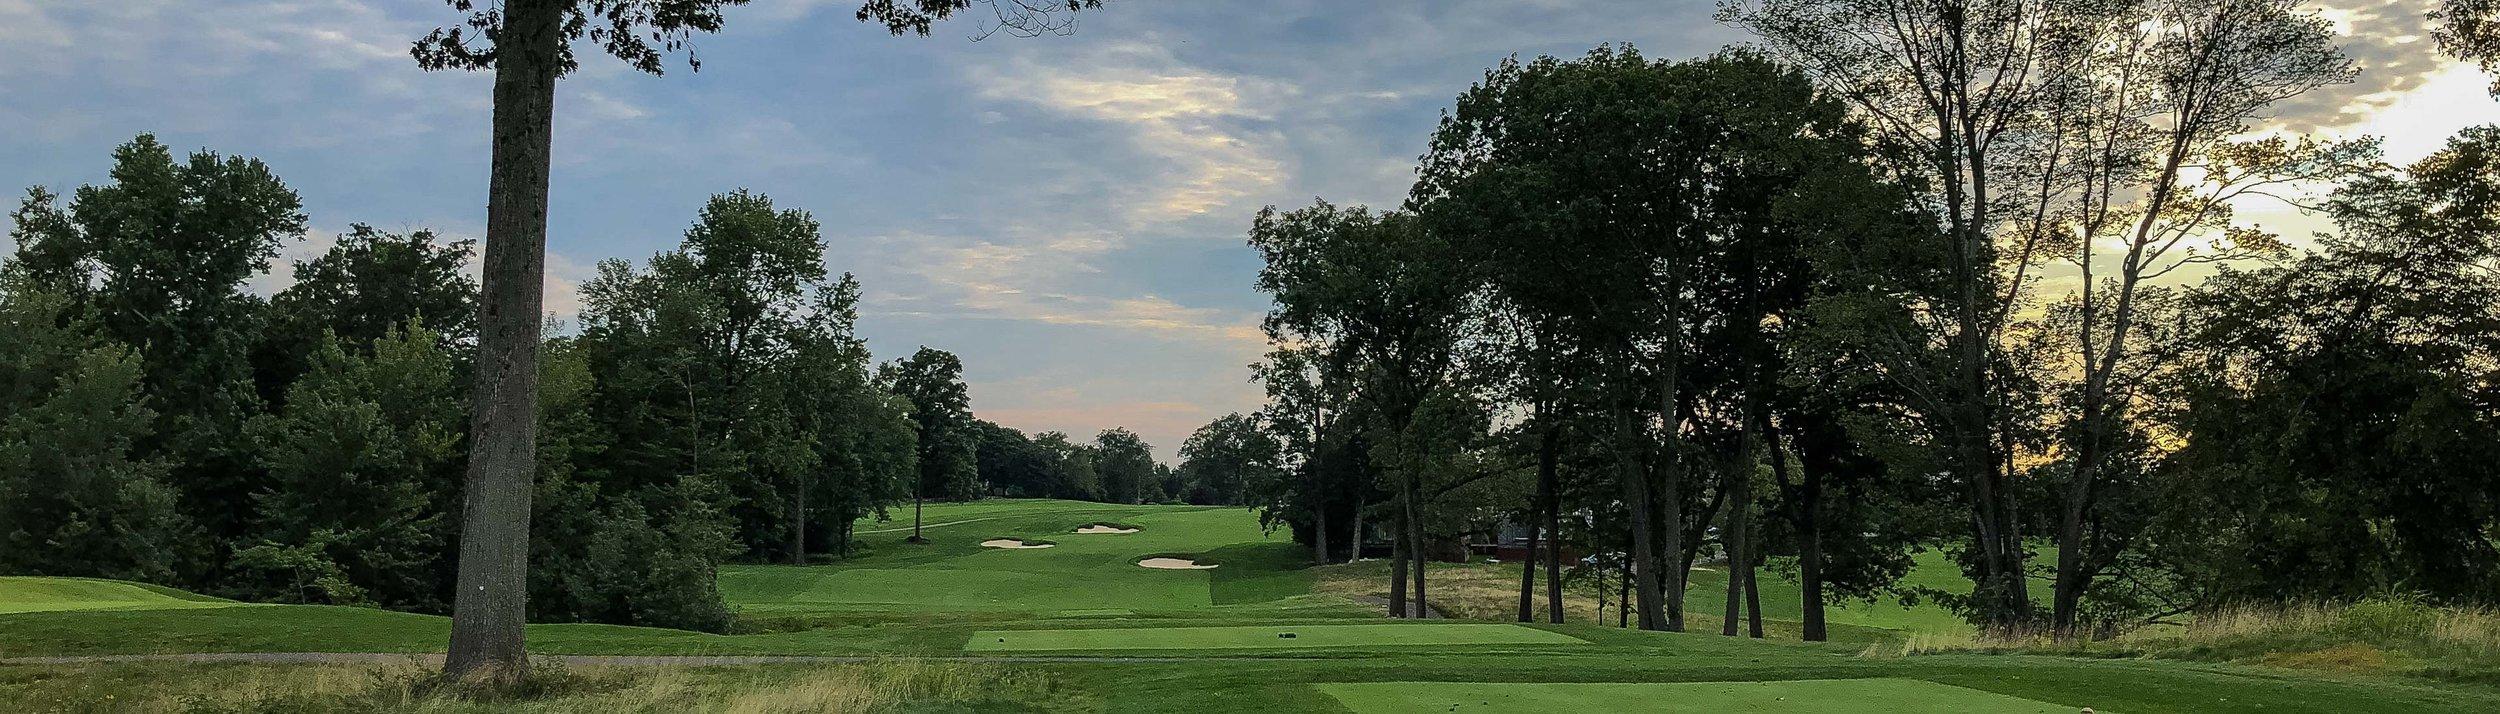 SCC 2018 Golf #18- HAP (3 of 7).jpg